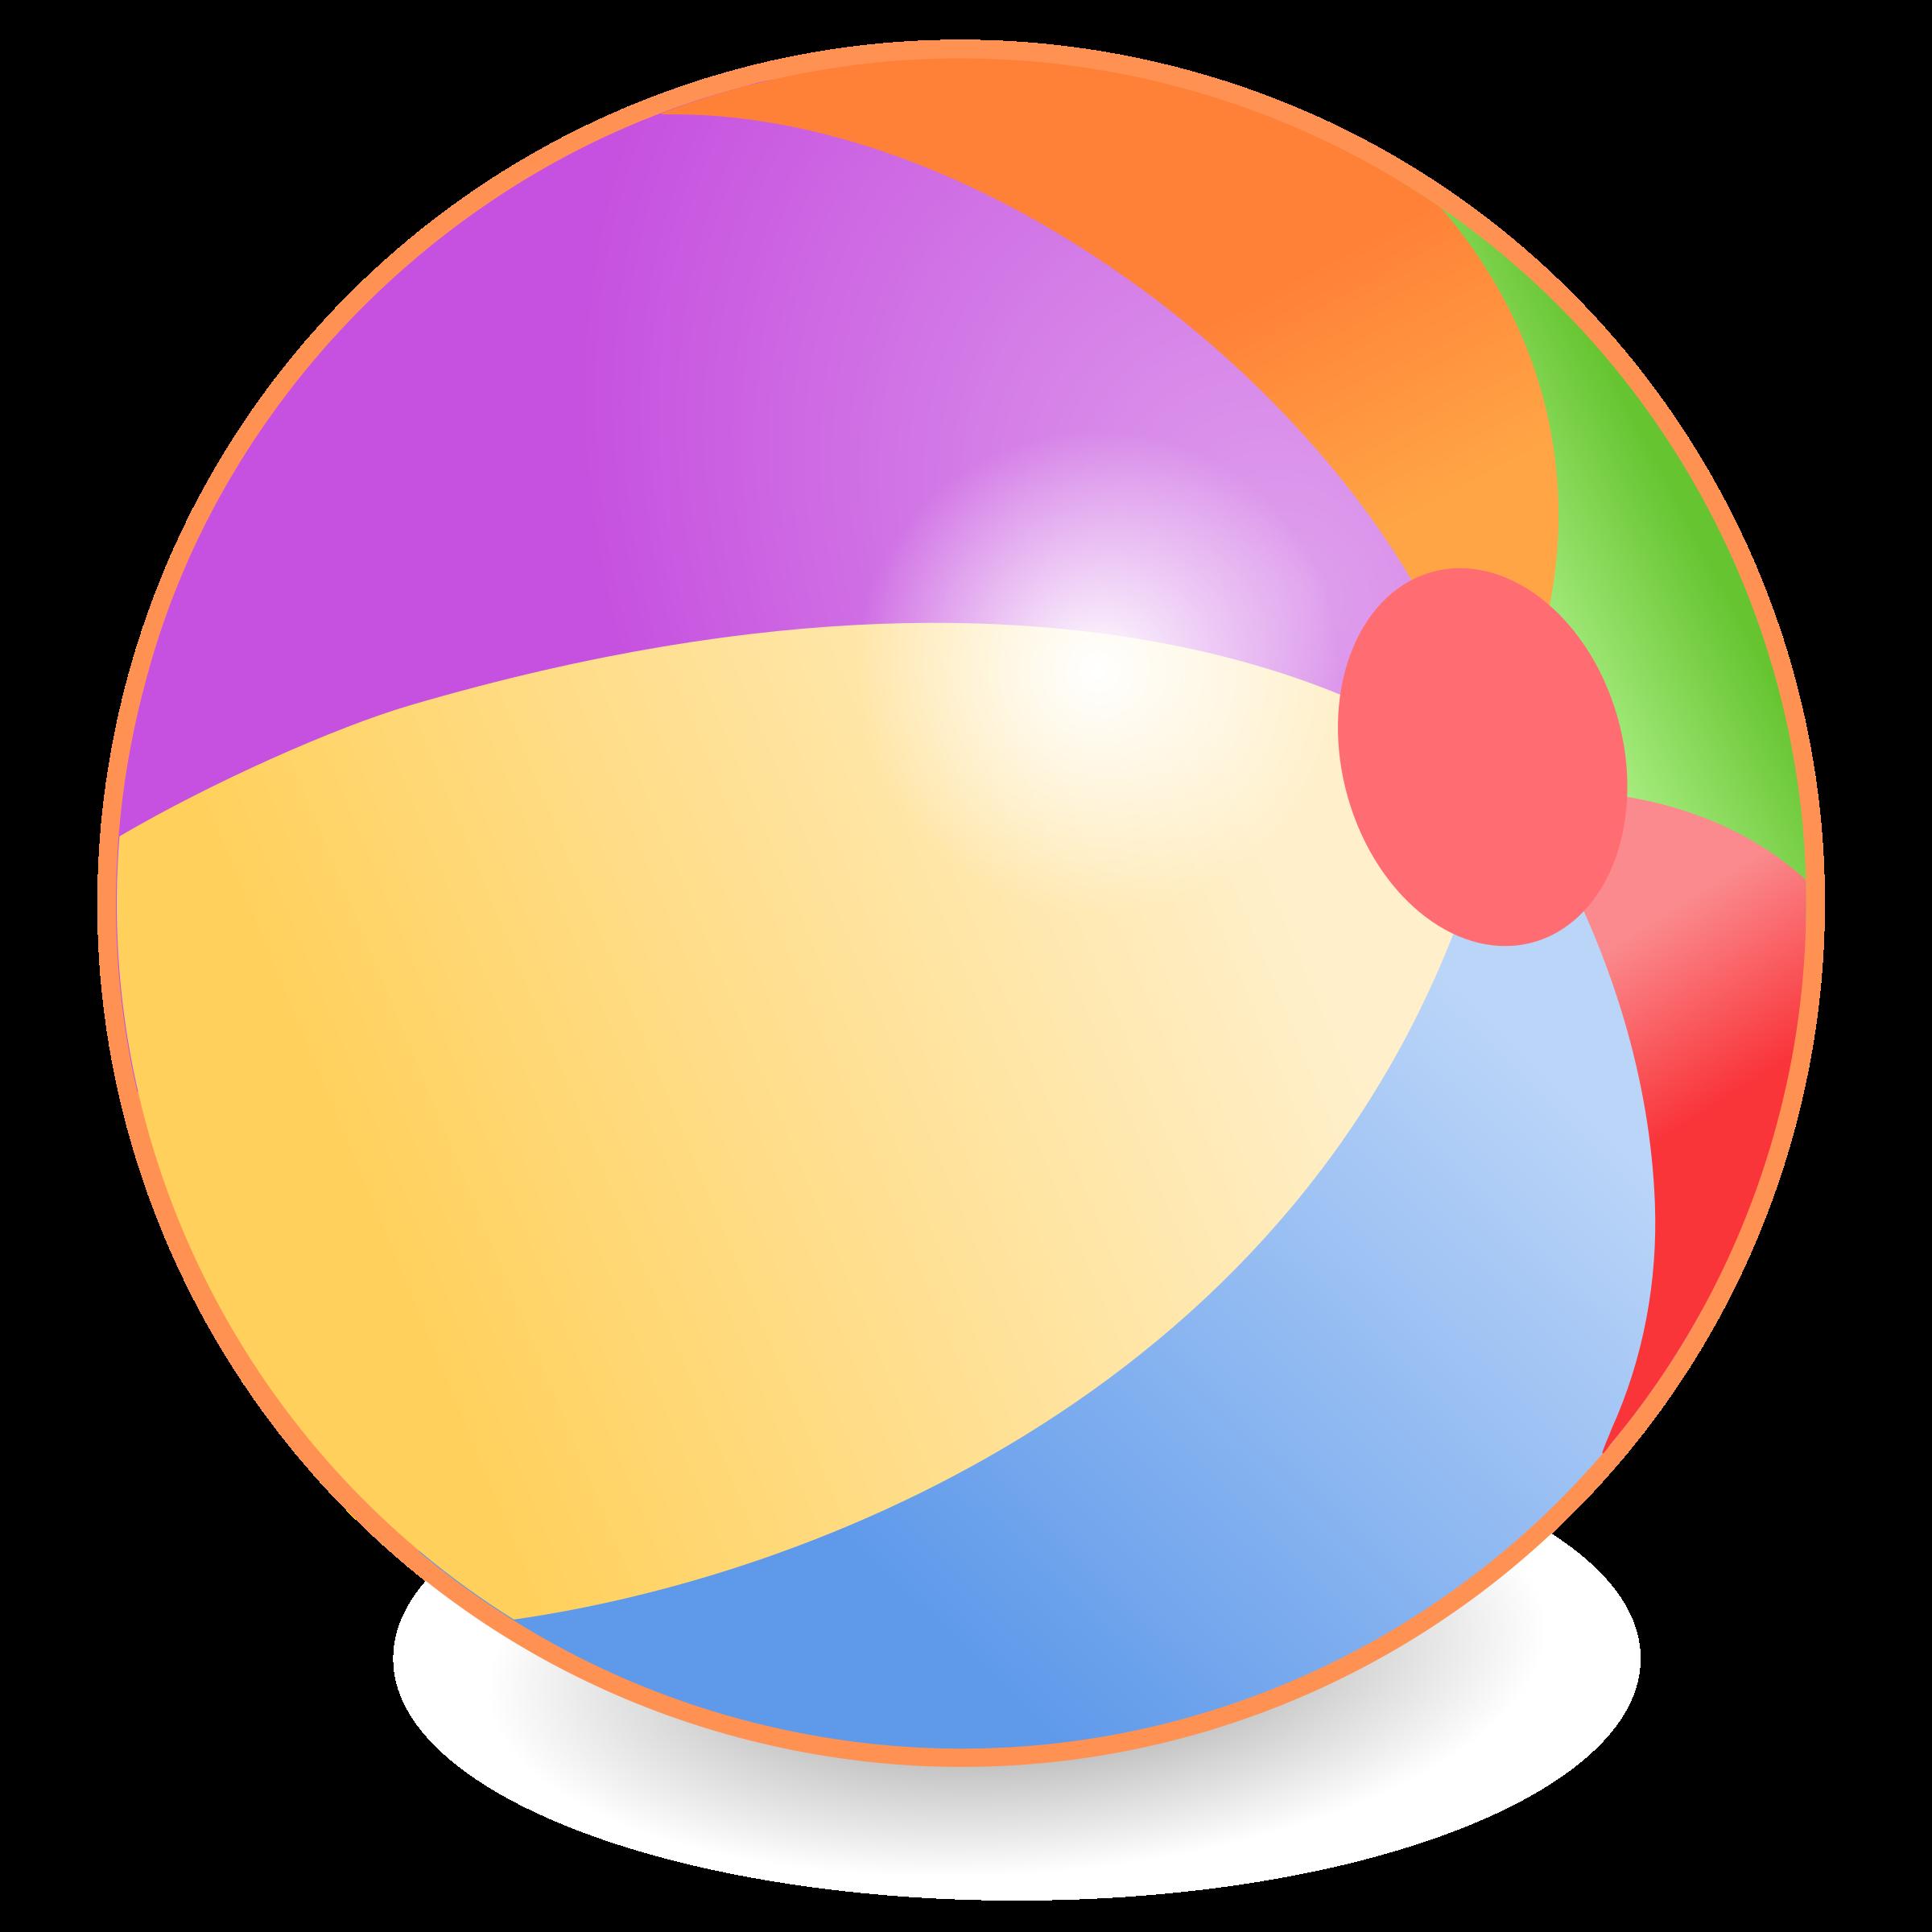 Beachball-Beachball-5